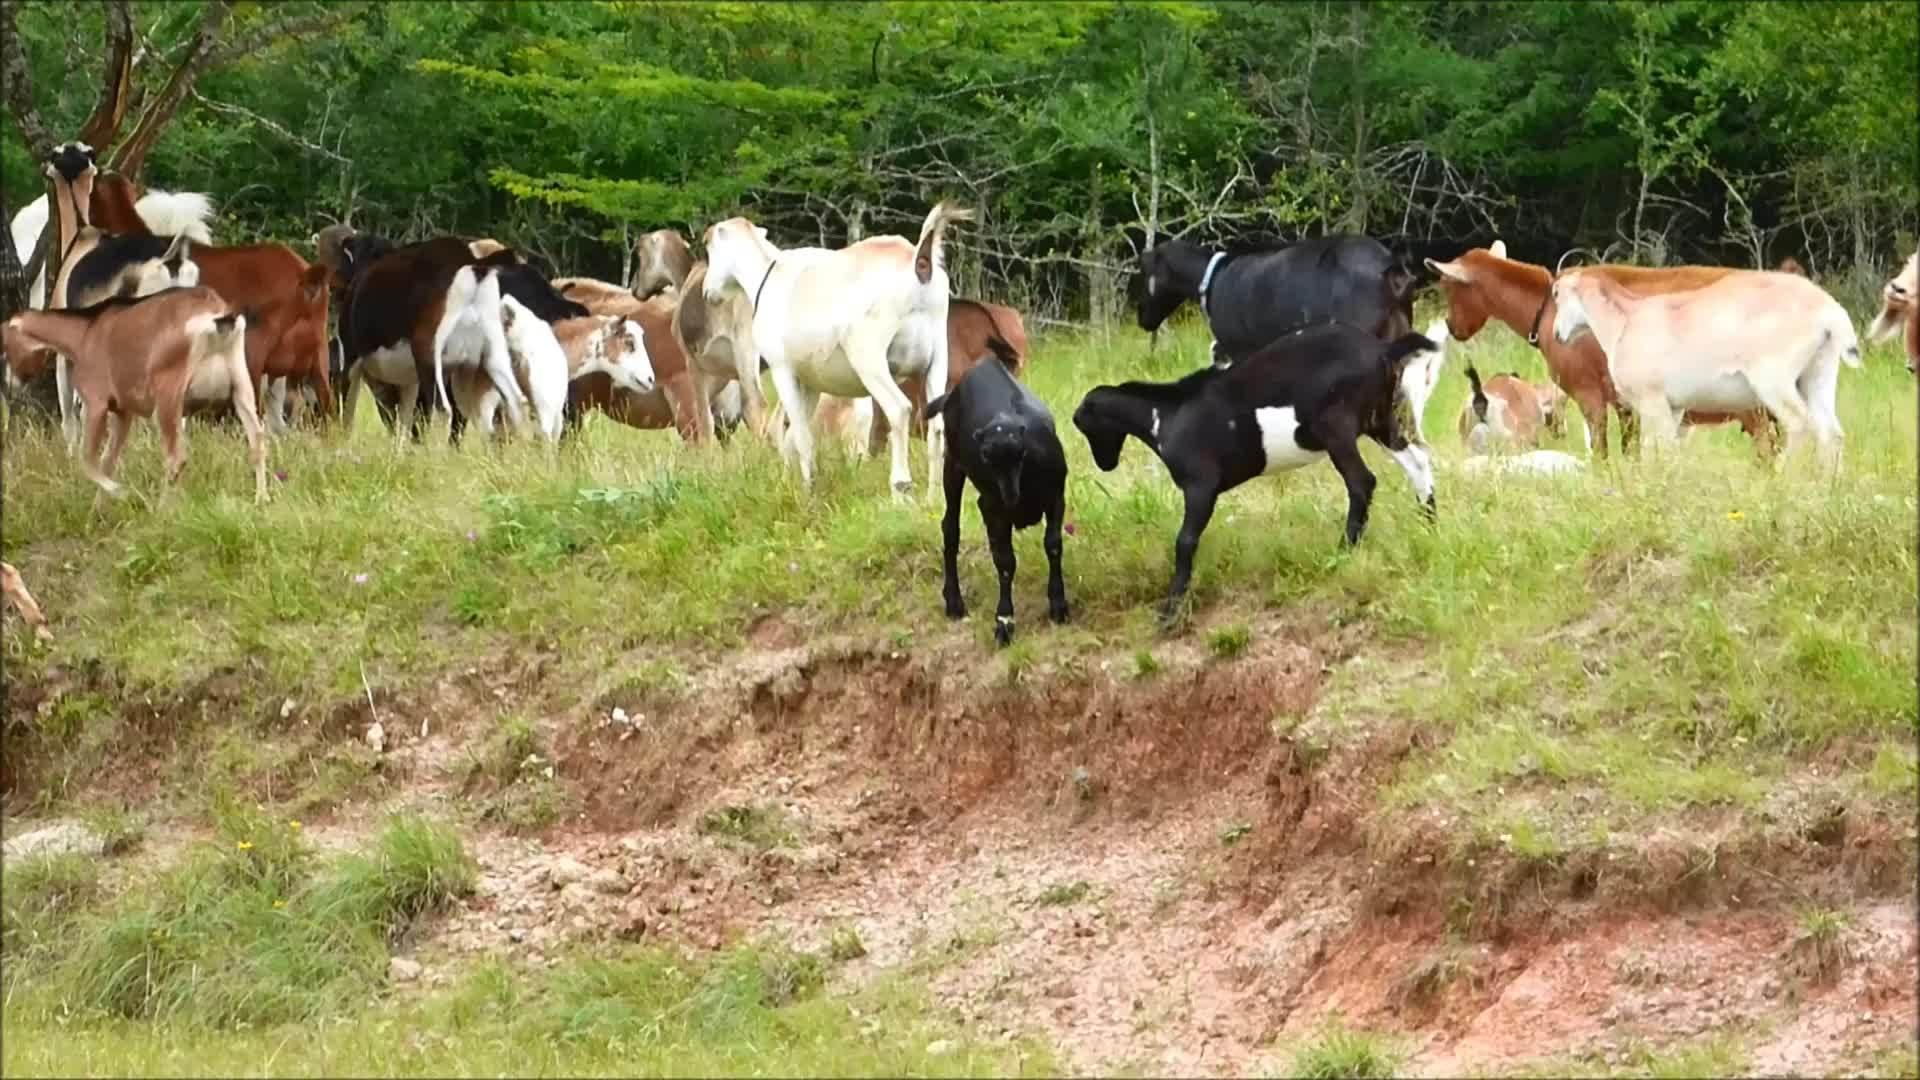 goat, goatparkour, parkour, Smooth Recoery GIFs